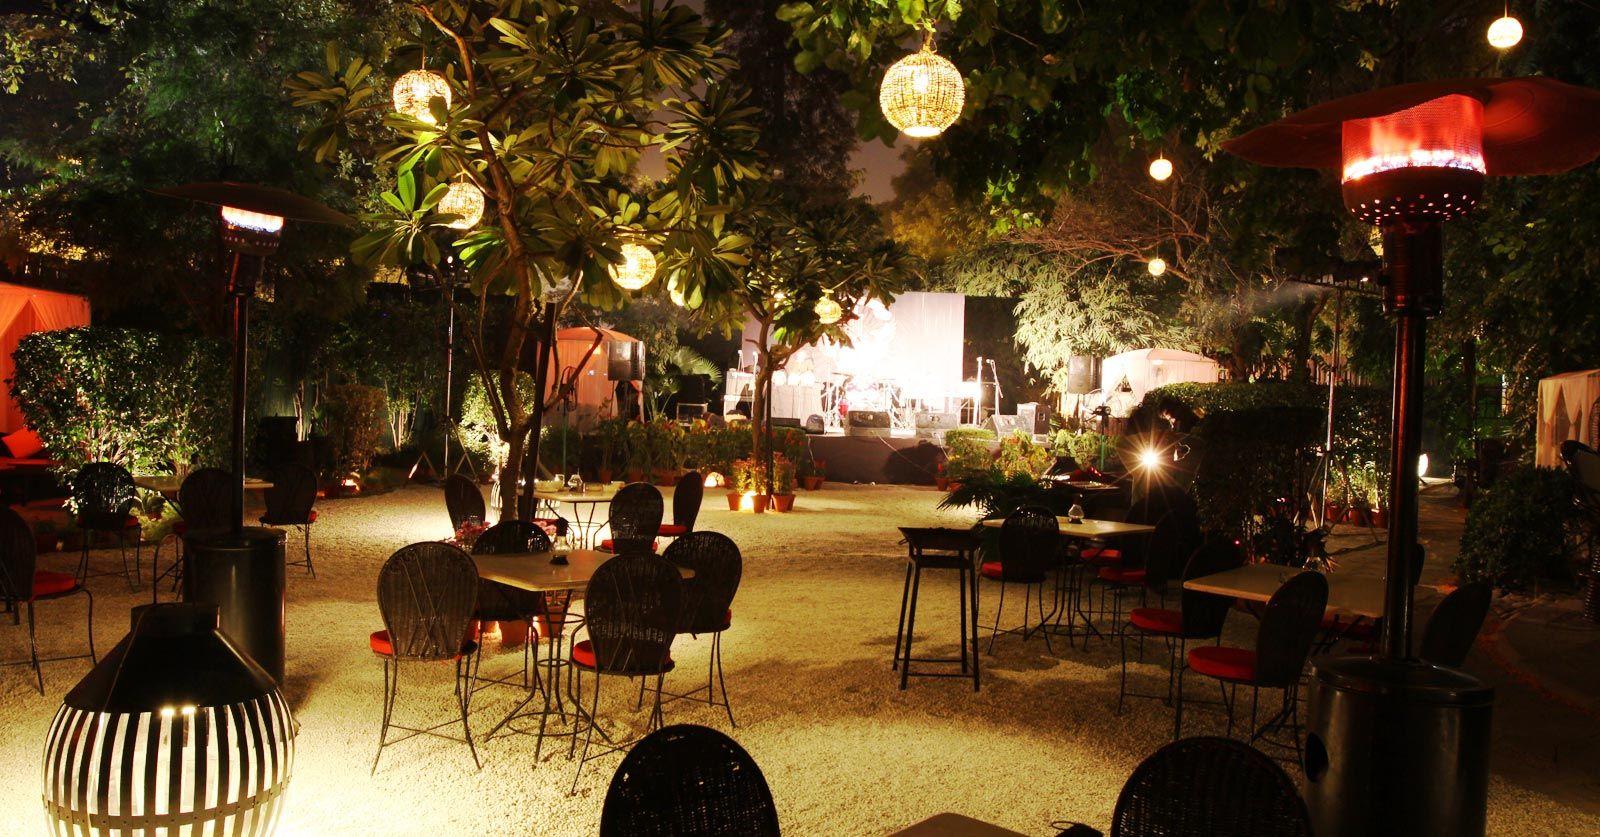 garden restaurant - Google Search | Outdoor Dining | Pinterest ...